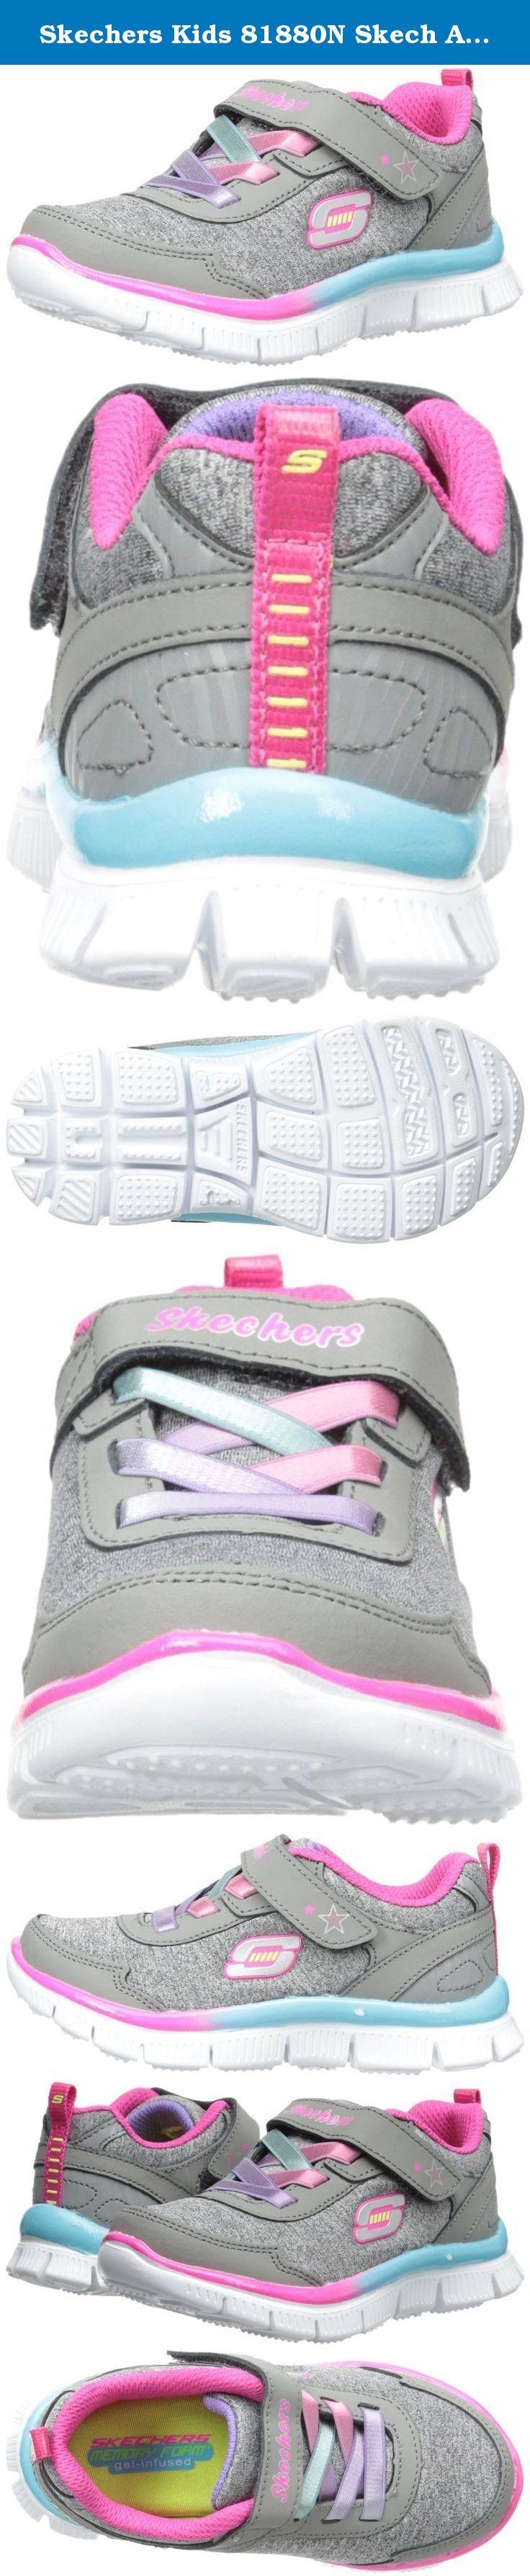 Skechers Kids 81880N Skech Appeal Athletic Sneaker ,Gray/Multi,5 M US Toddler. She'll love the fun sporty style of the LIL FLYER slip-on sneakers from SKECHERS.